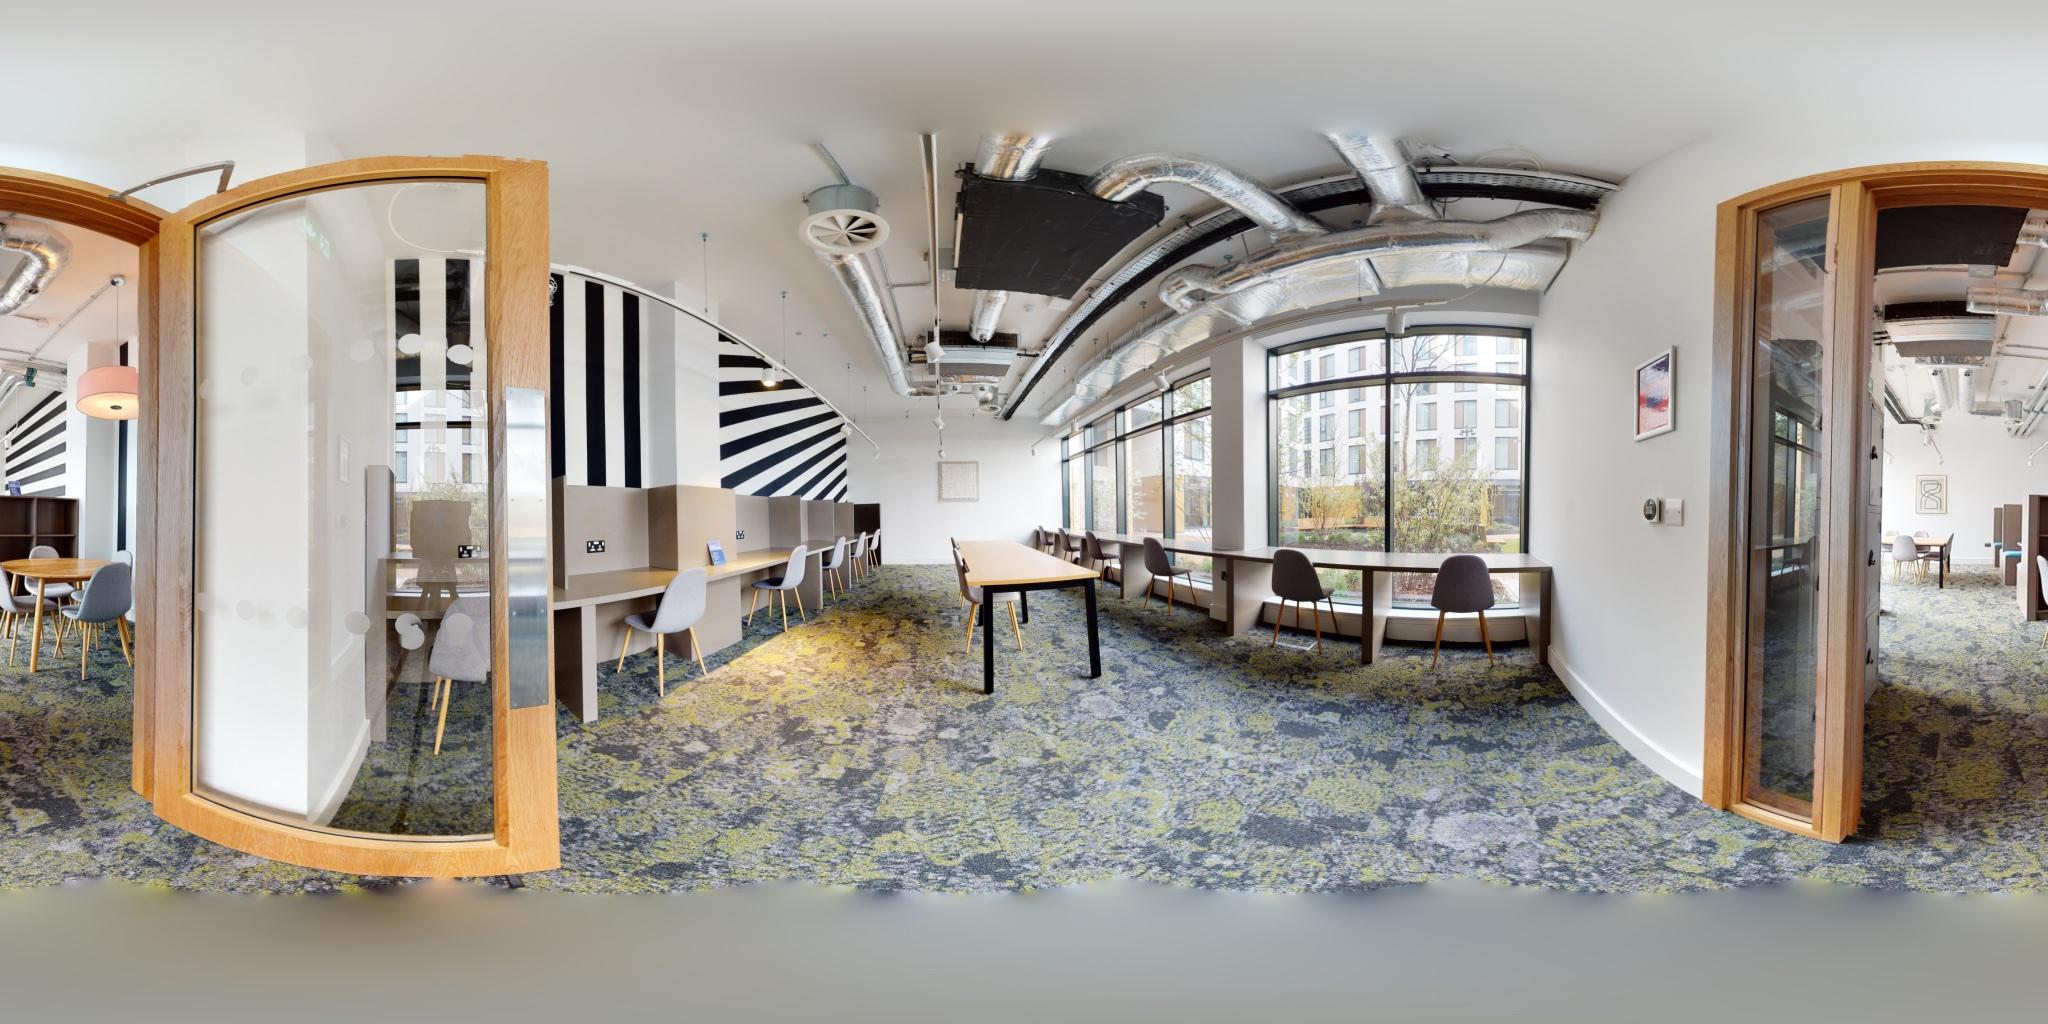 Student Residence Accommodation 360°Walkthrough Experience Ireland